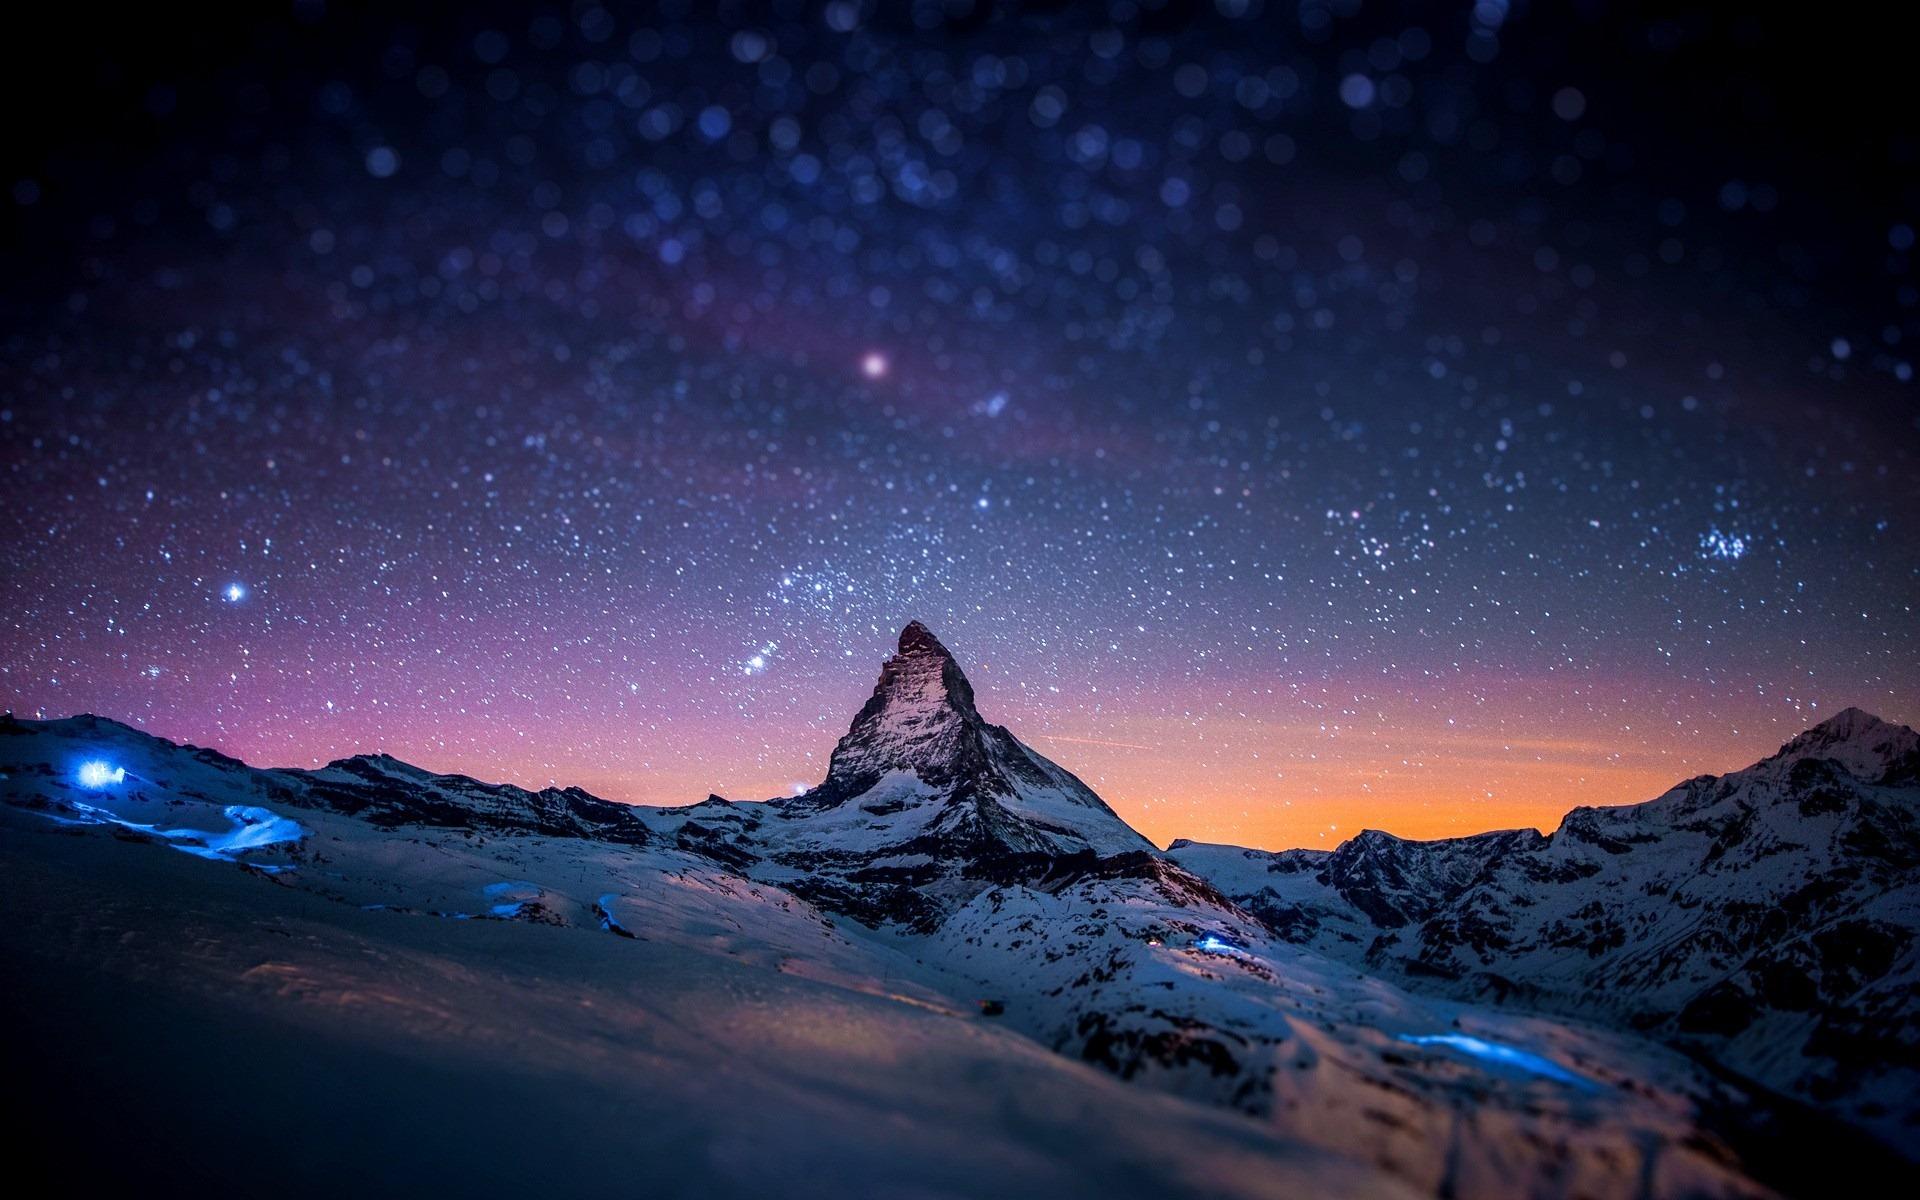 The Night Sky Wallpaper beautiful night skyjpg 1920x1200